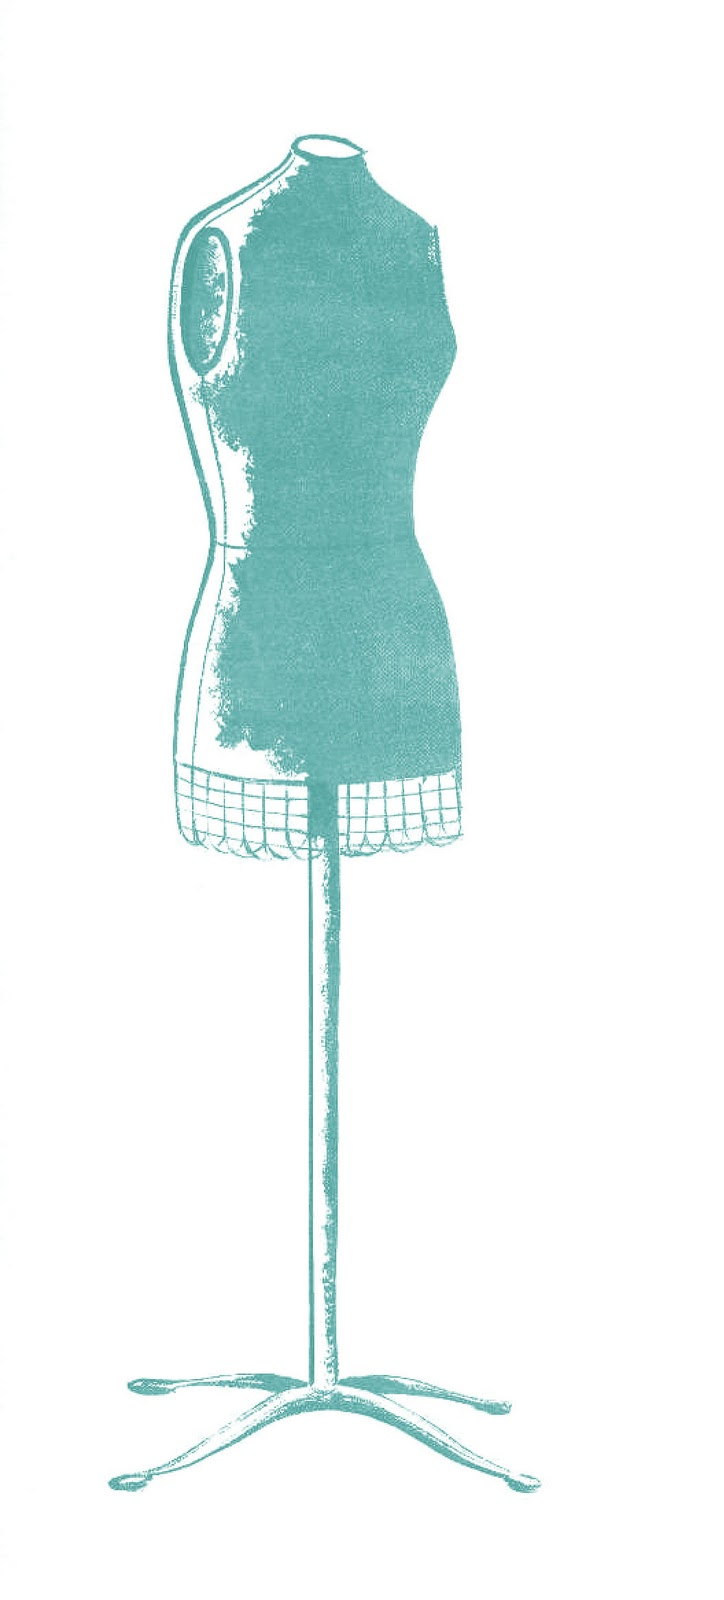 Retro Clip Art Cute Dress Forms The Graphics Fairy